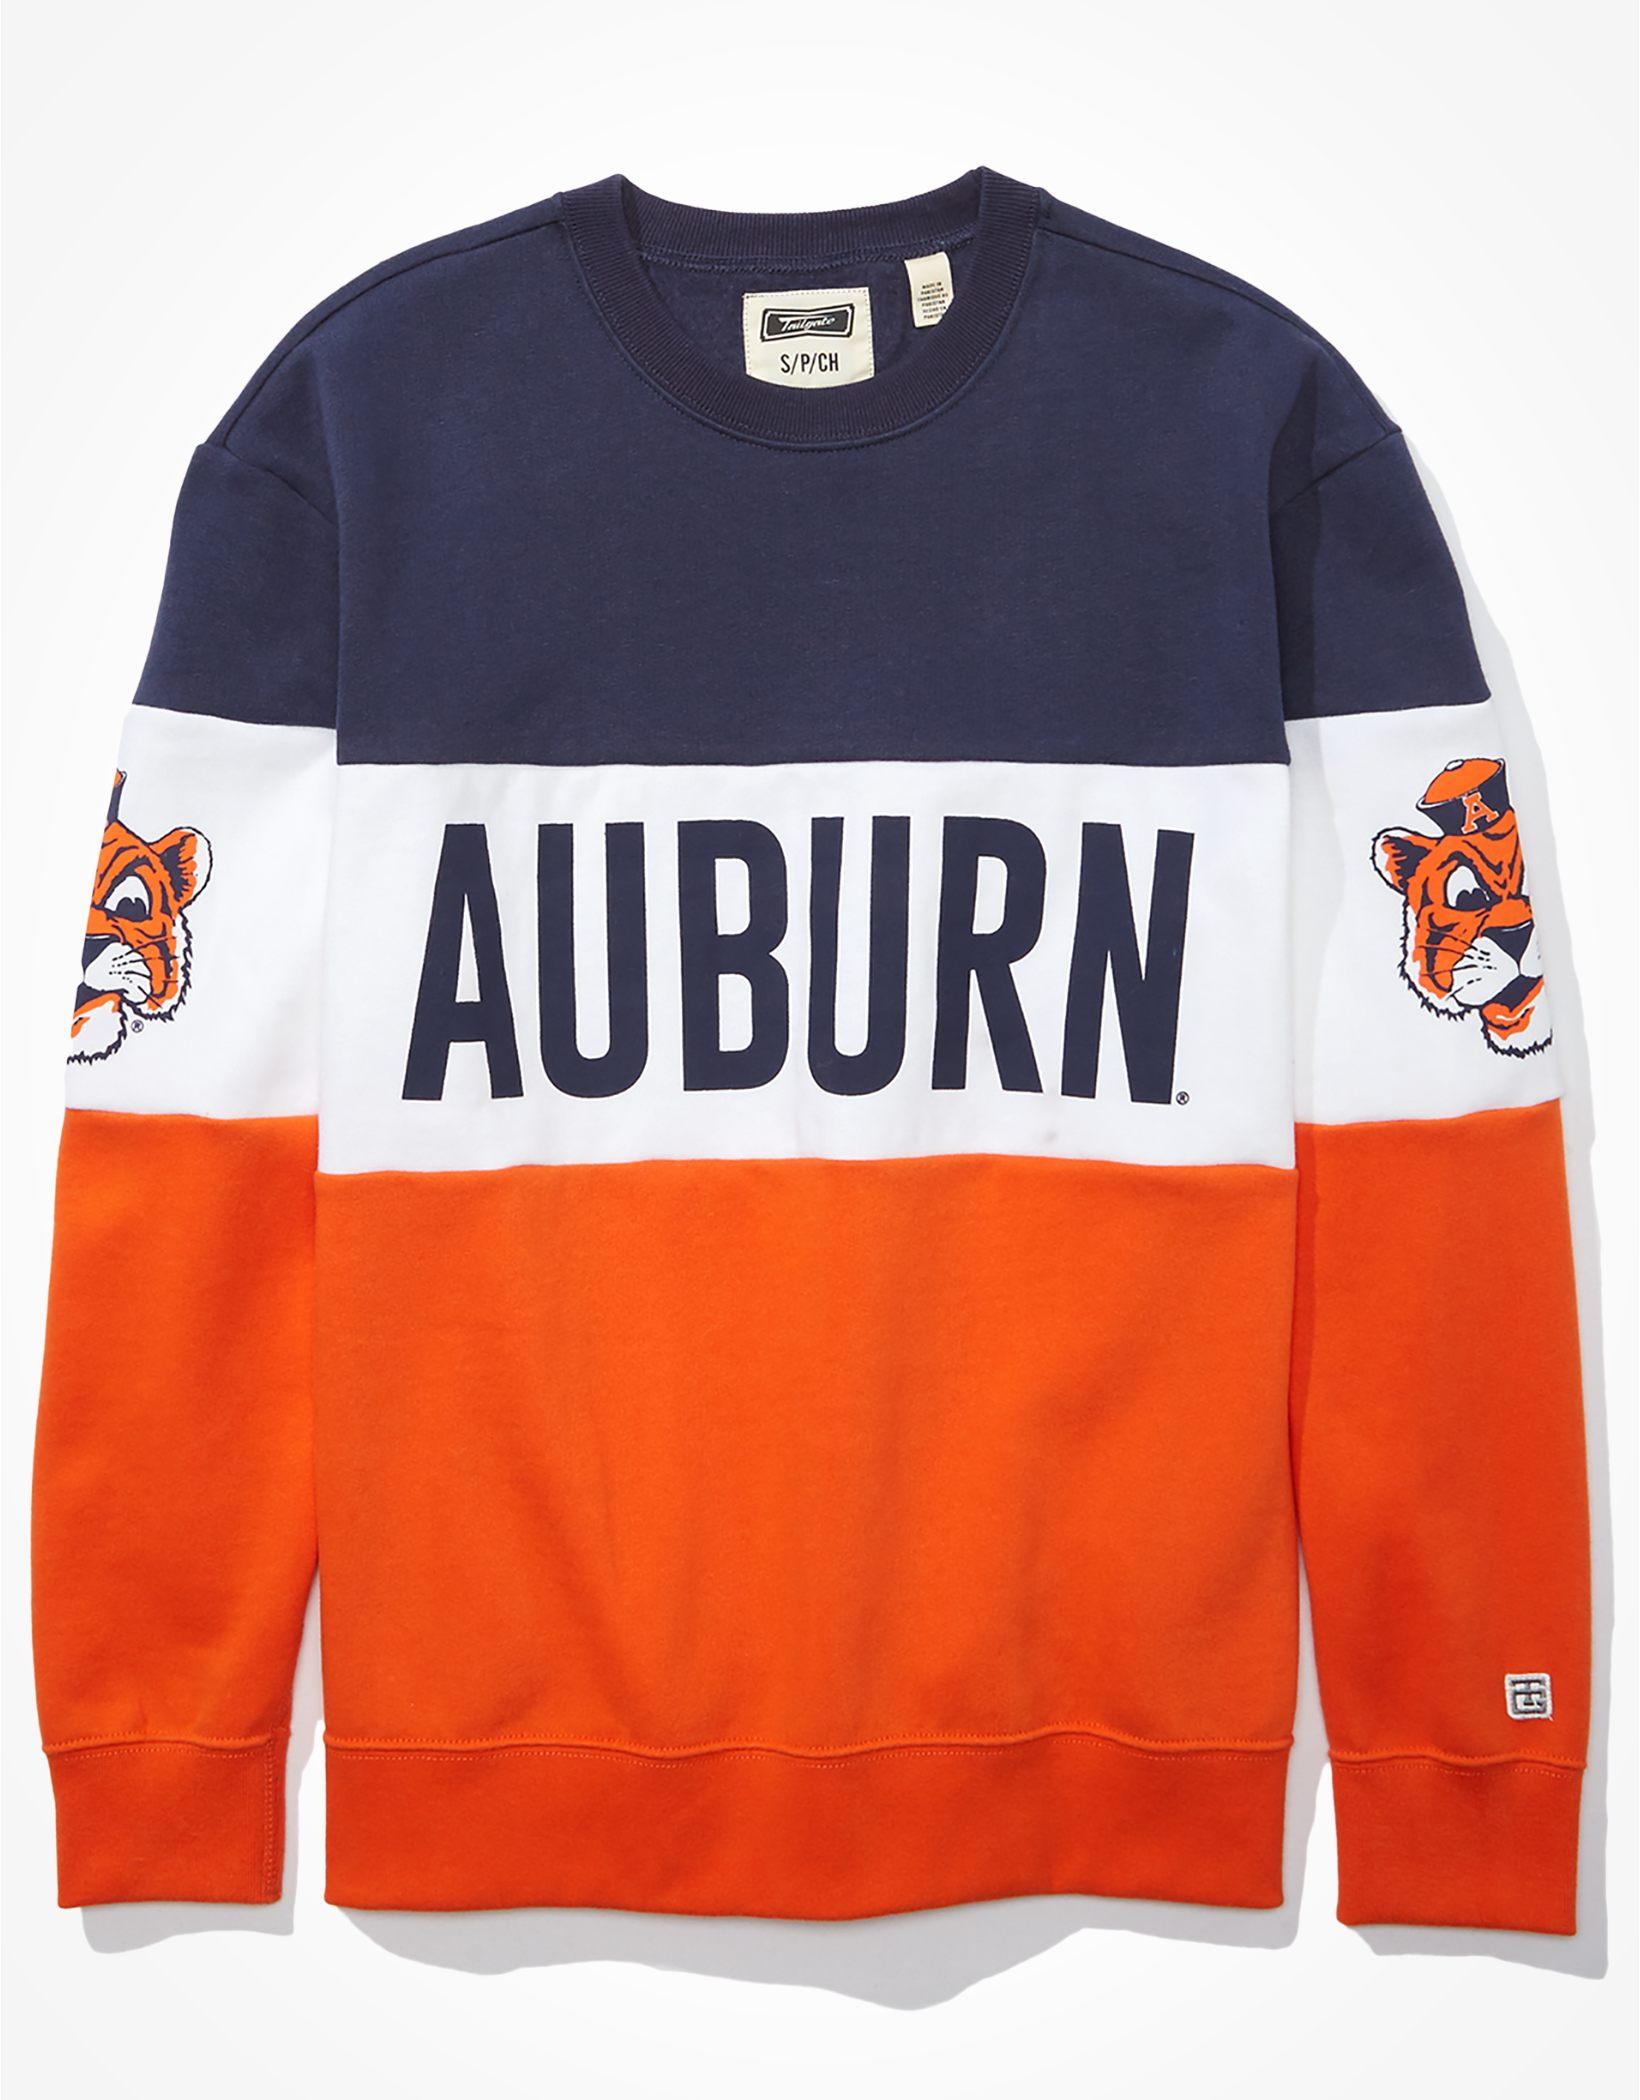 Tailgate Women's Auburn Tigers Colorblock Sweatshirt